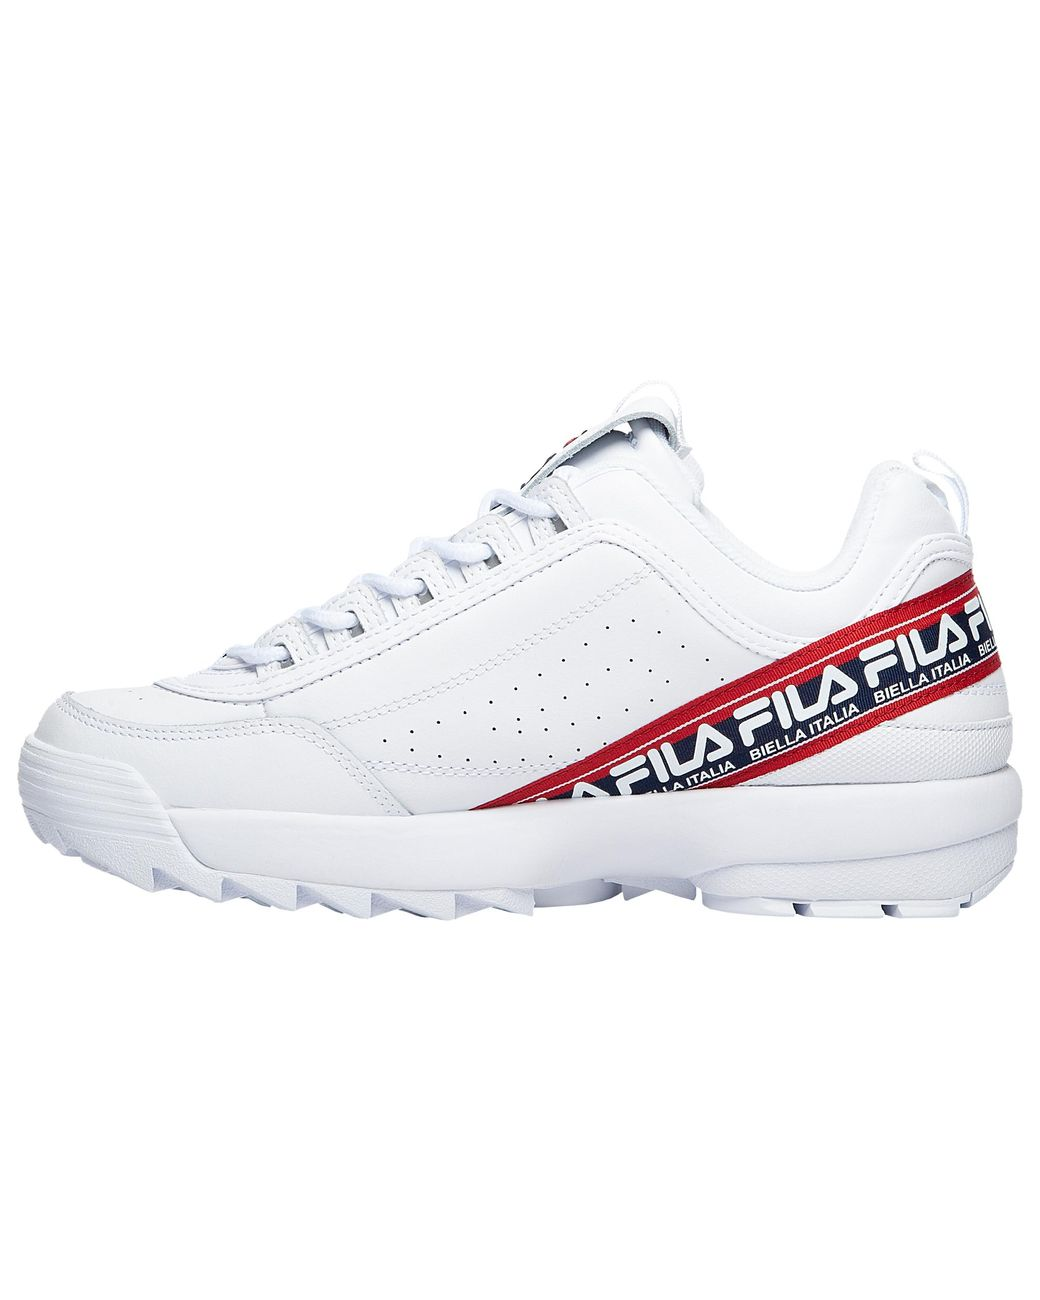 Fila Suede Disruptor Ii Italia - Shoes